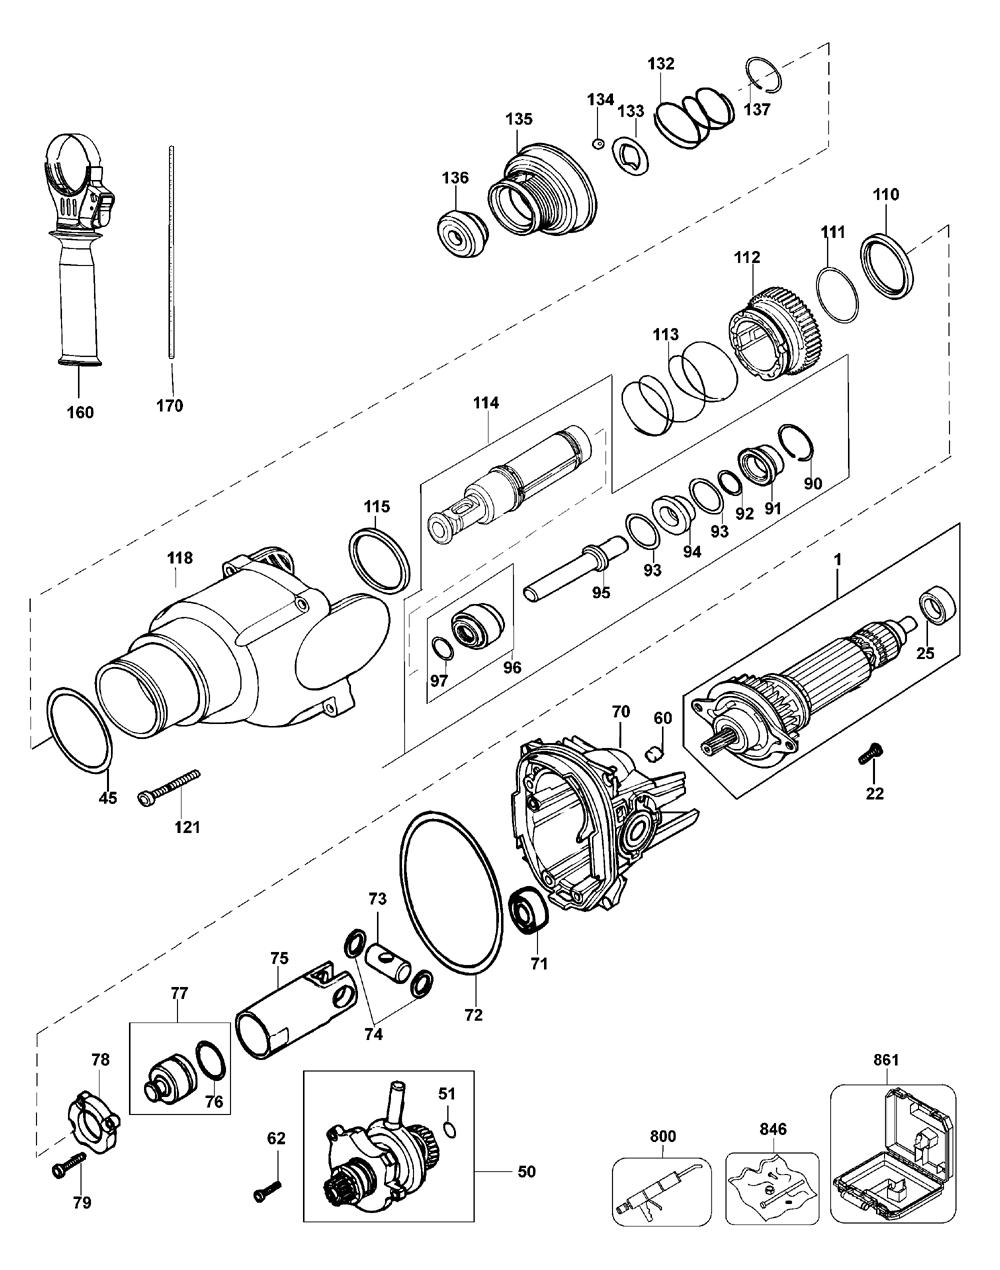 D25201K-Dewalt-T2-PB-1Break Down